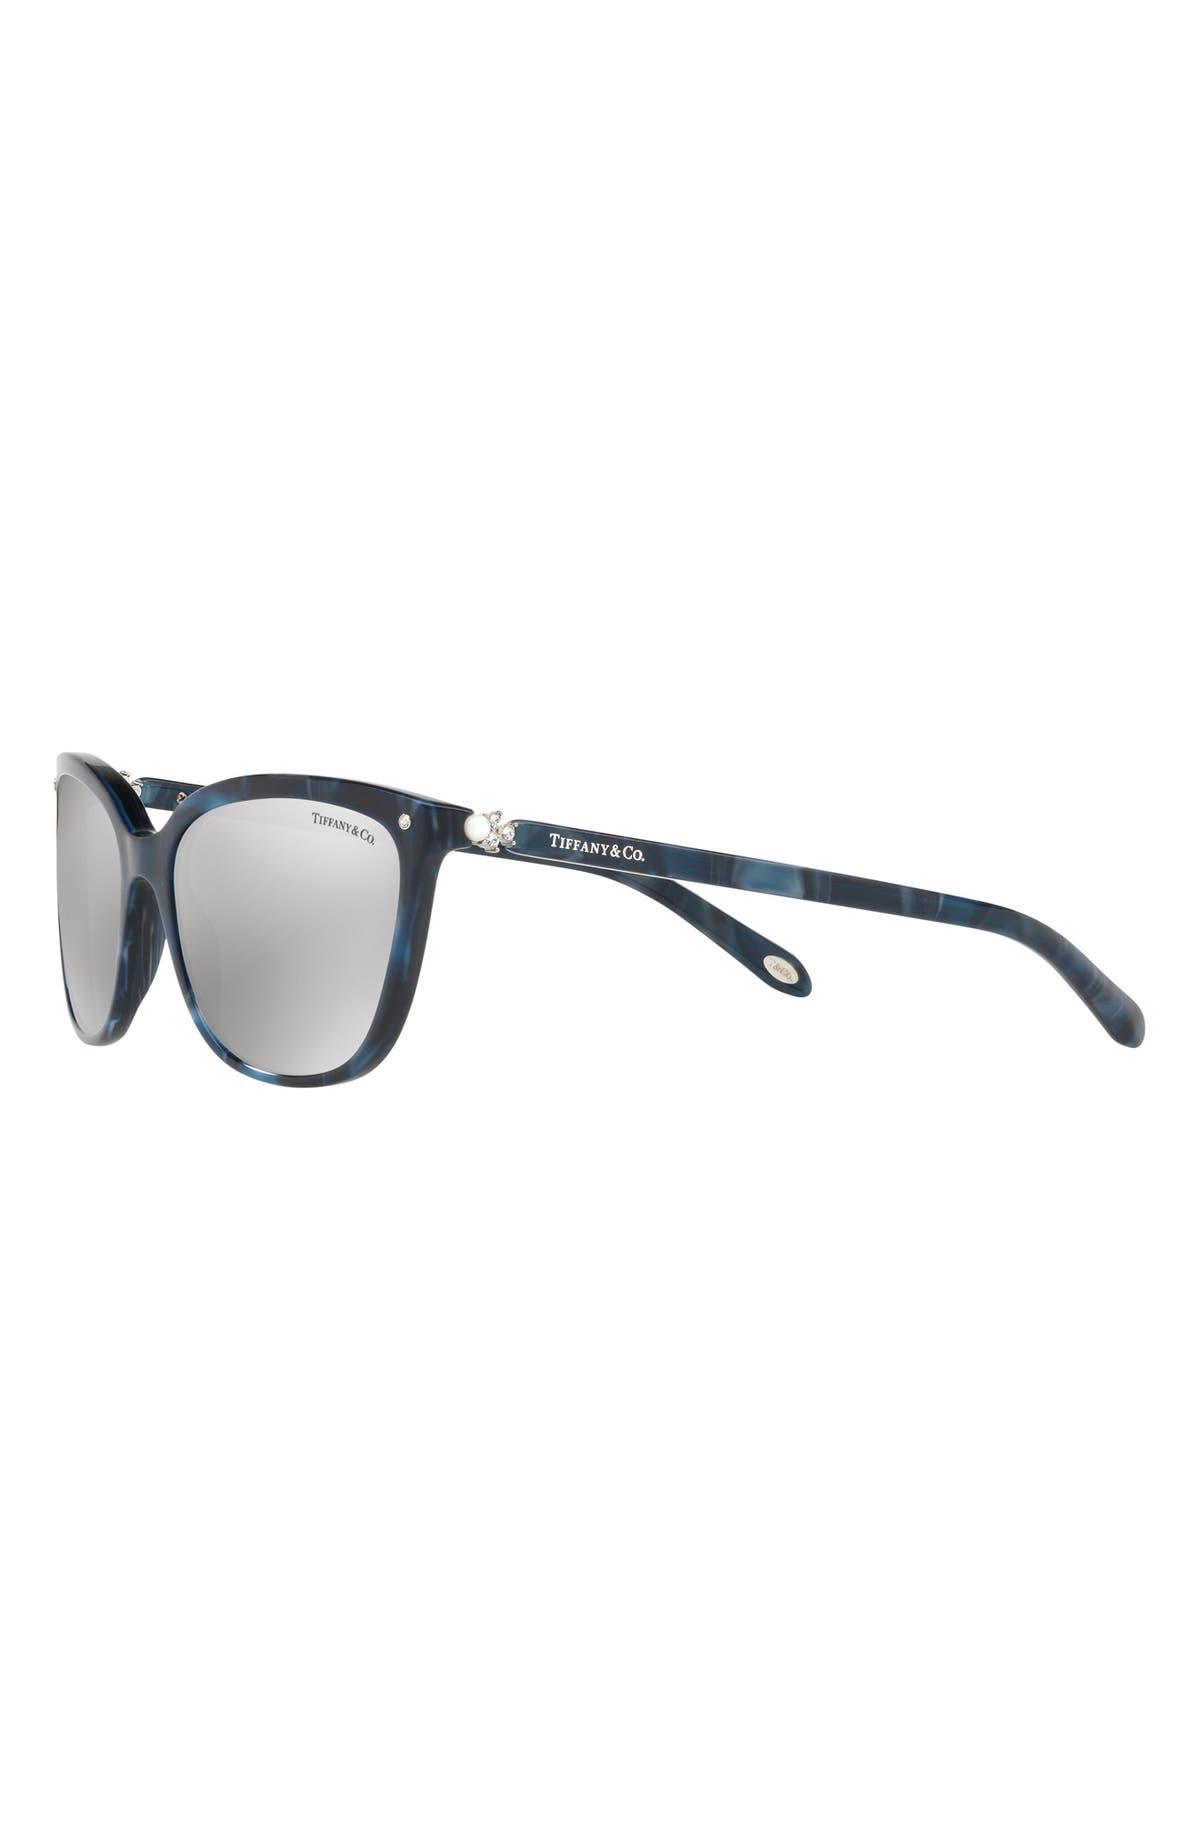 09b1291d39 Tiffany   Co. 55mm Mirrored Square Sunglasses